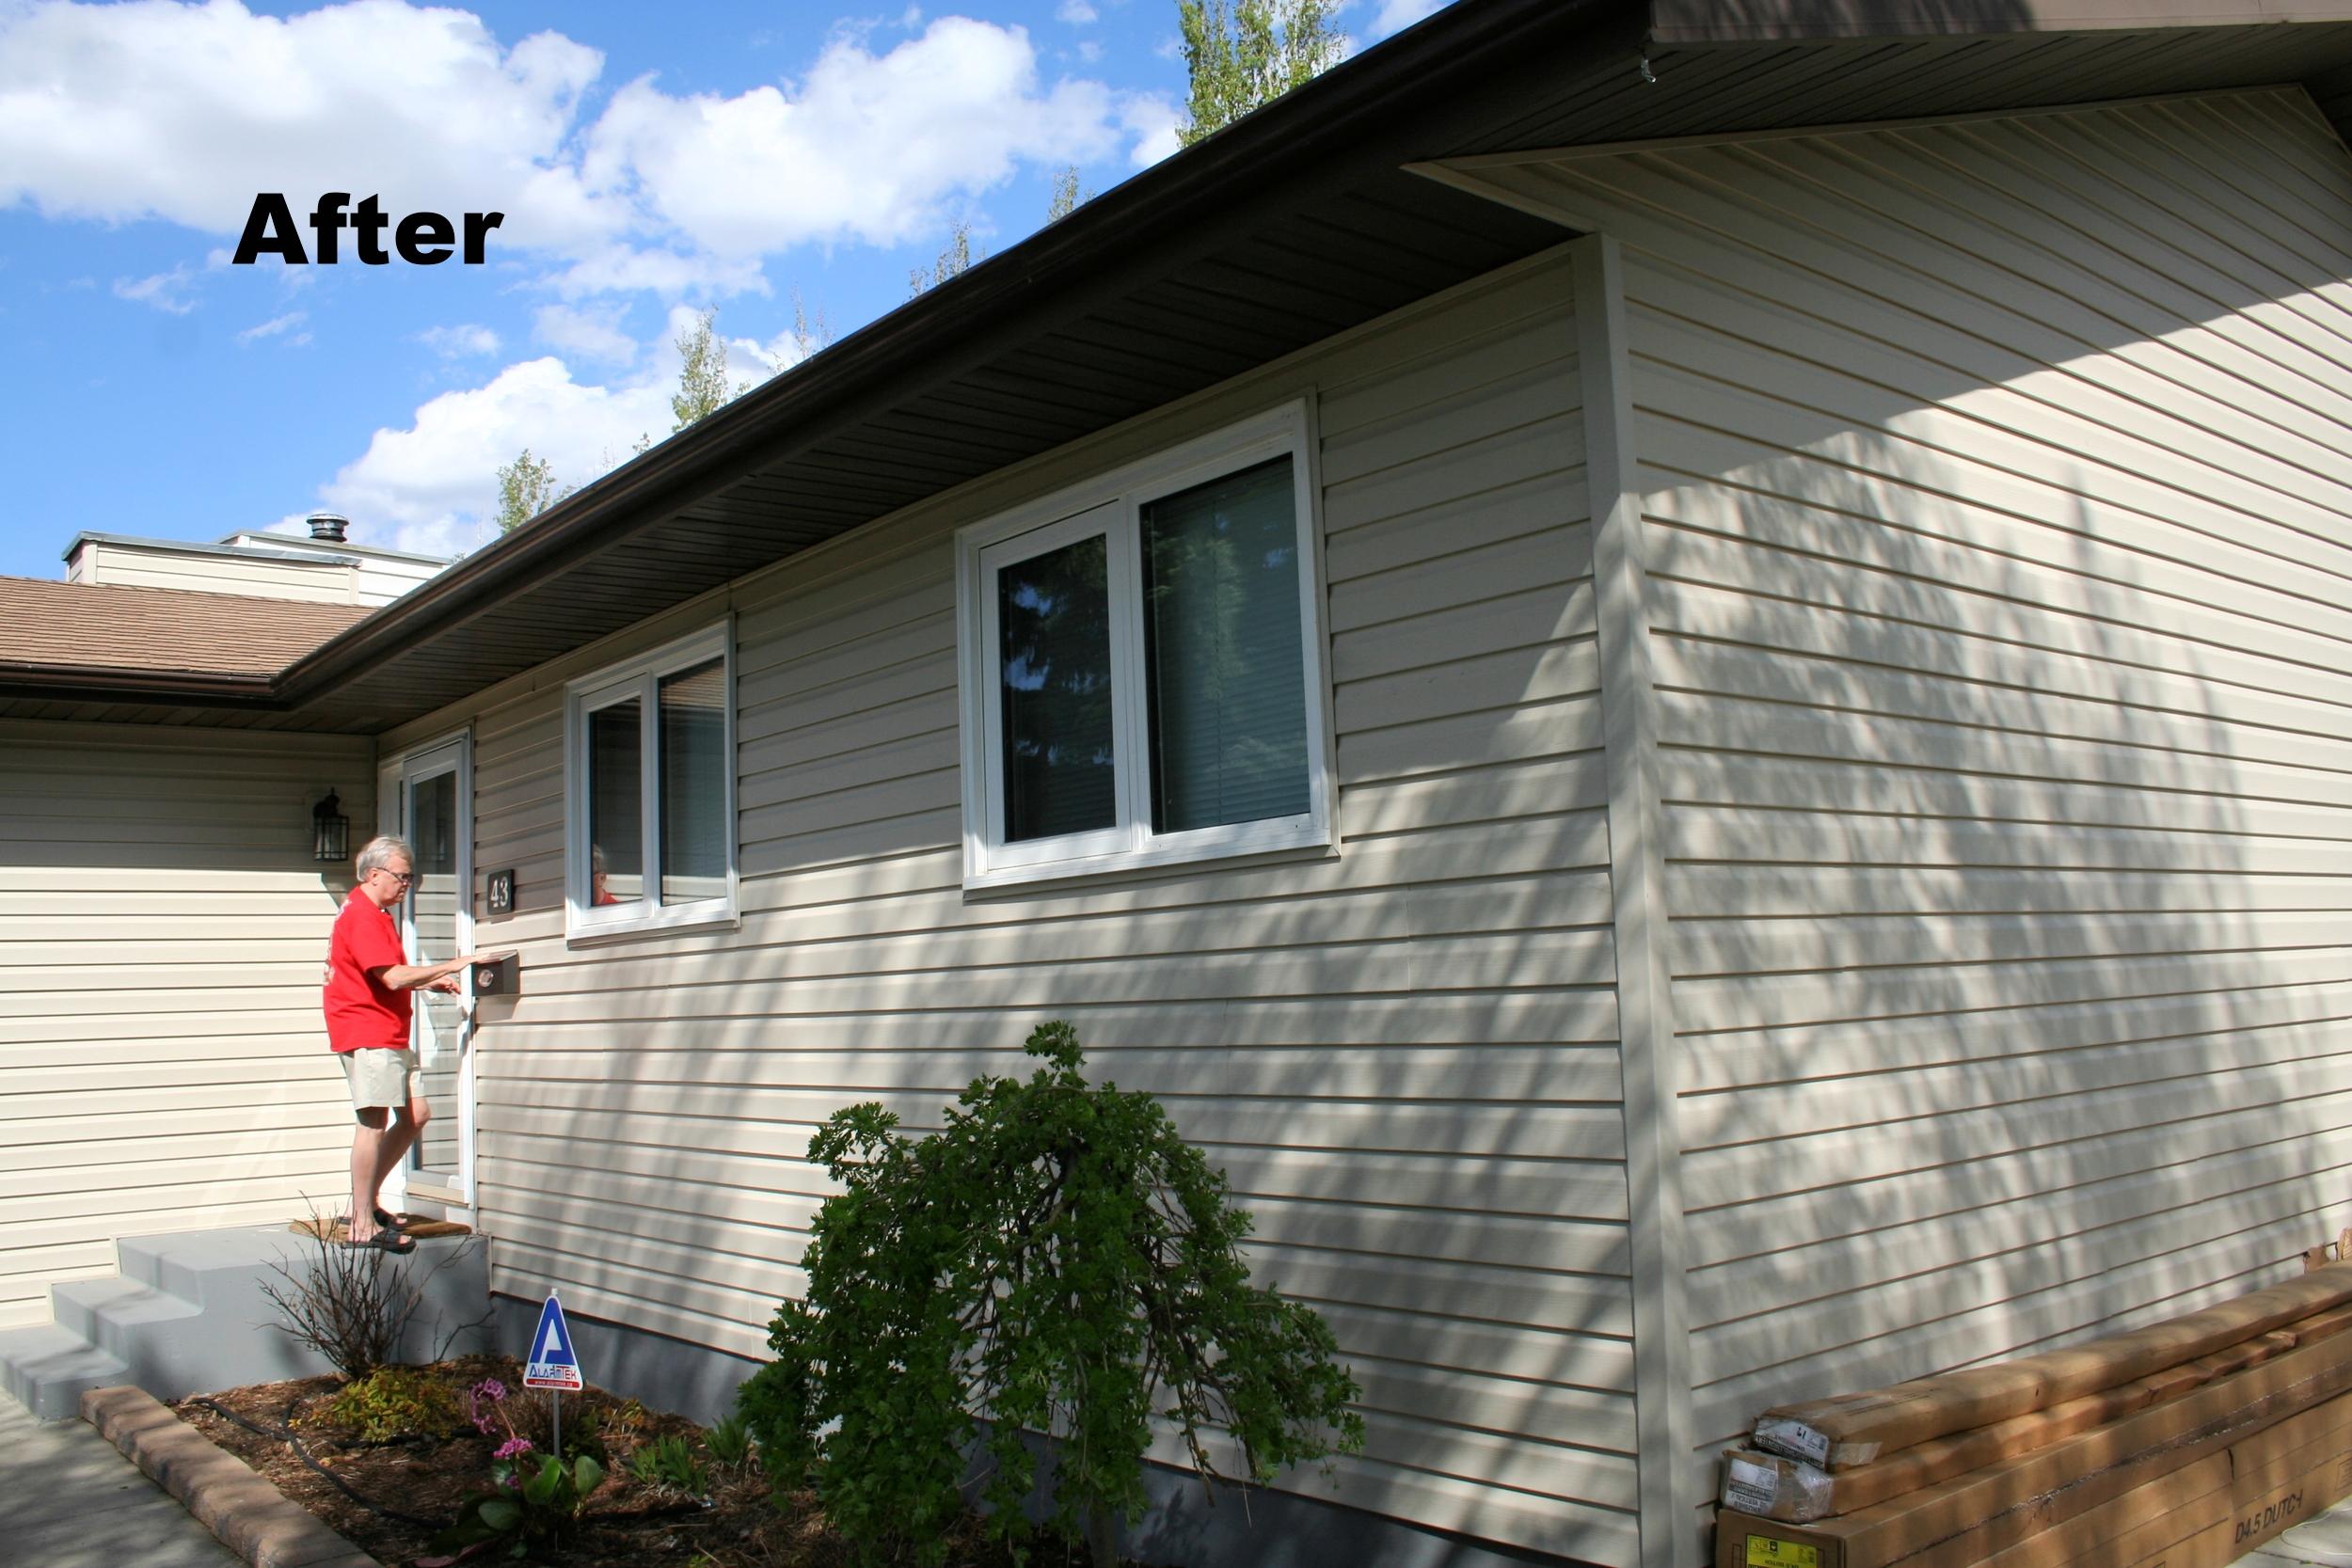 Siding saskatoon, exterior renovation, trusted contractor